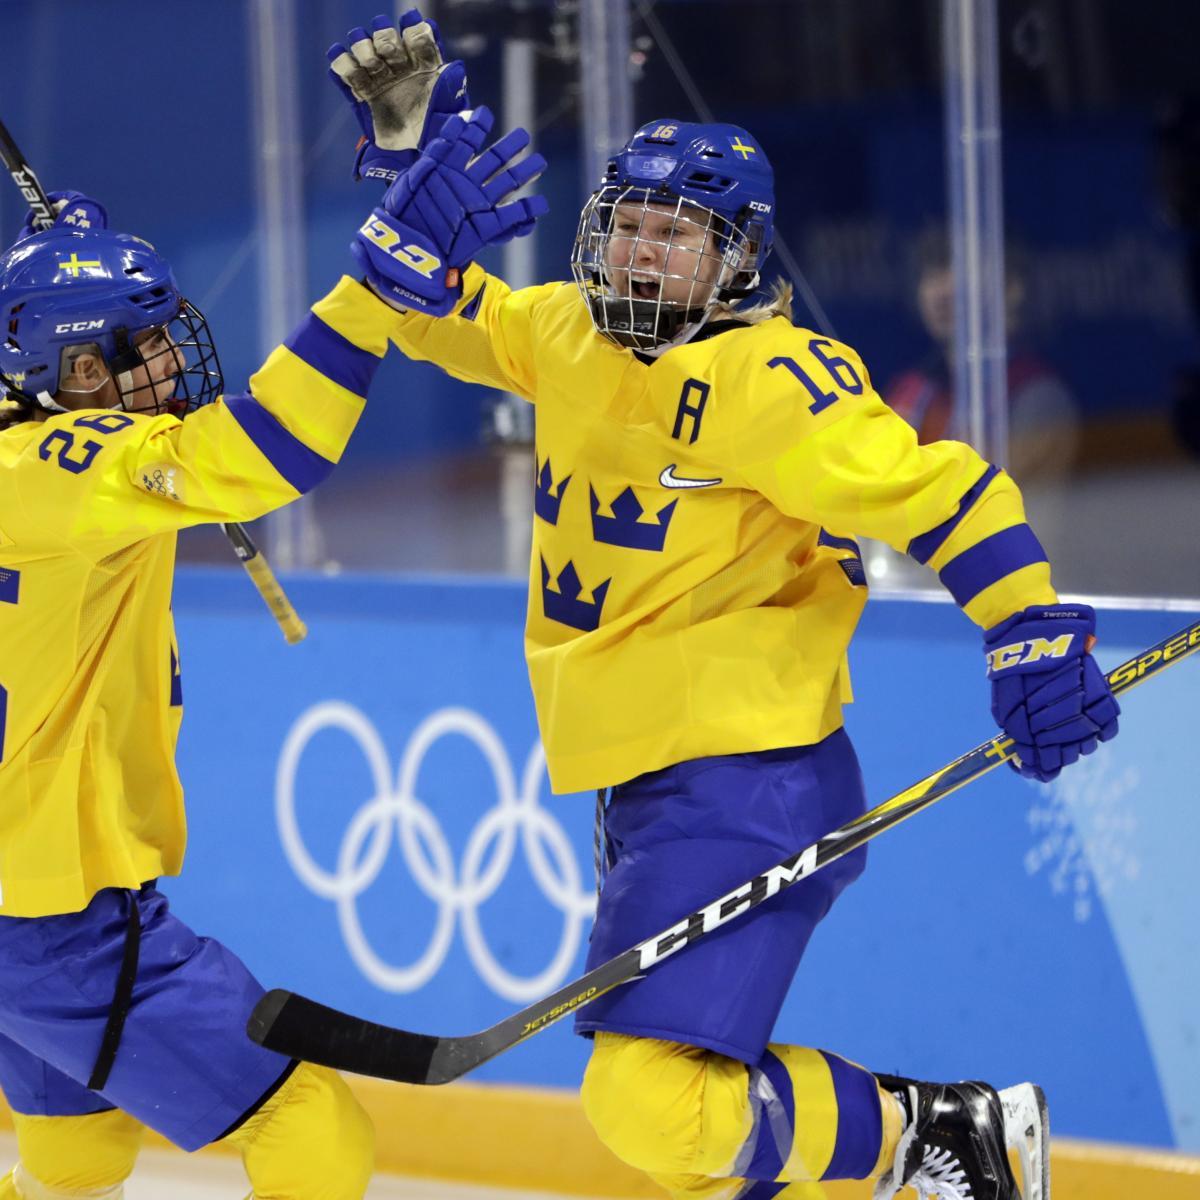 Olympic Hockey Results 2018: Switzerland, Sweden Win on ...